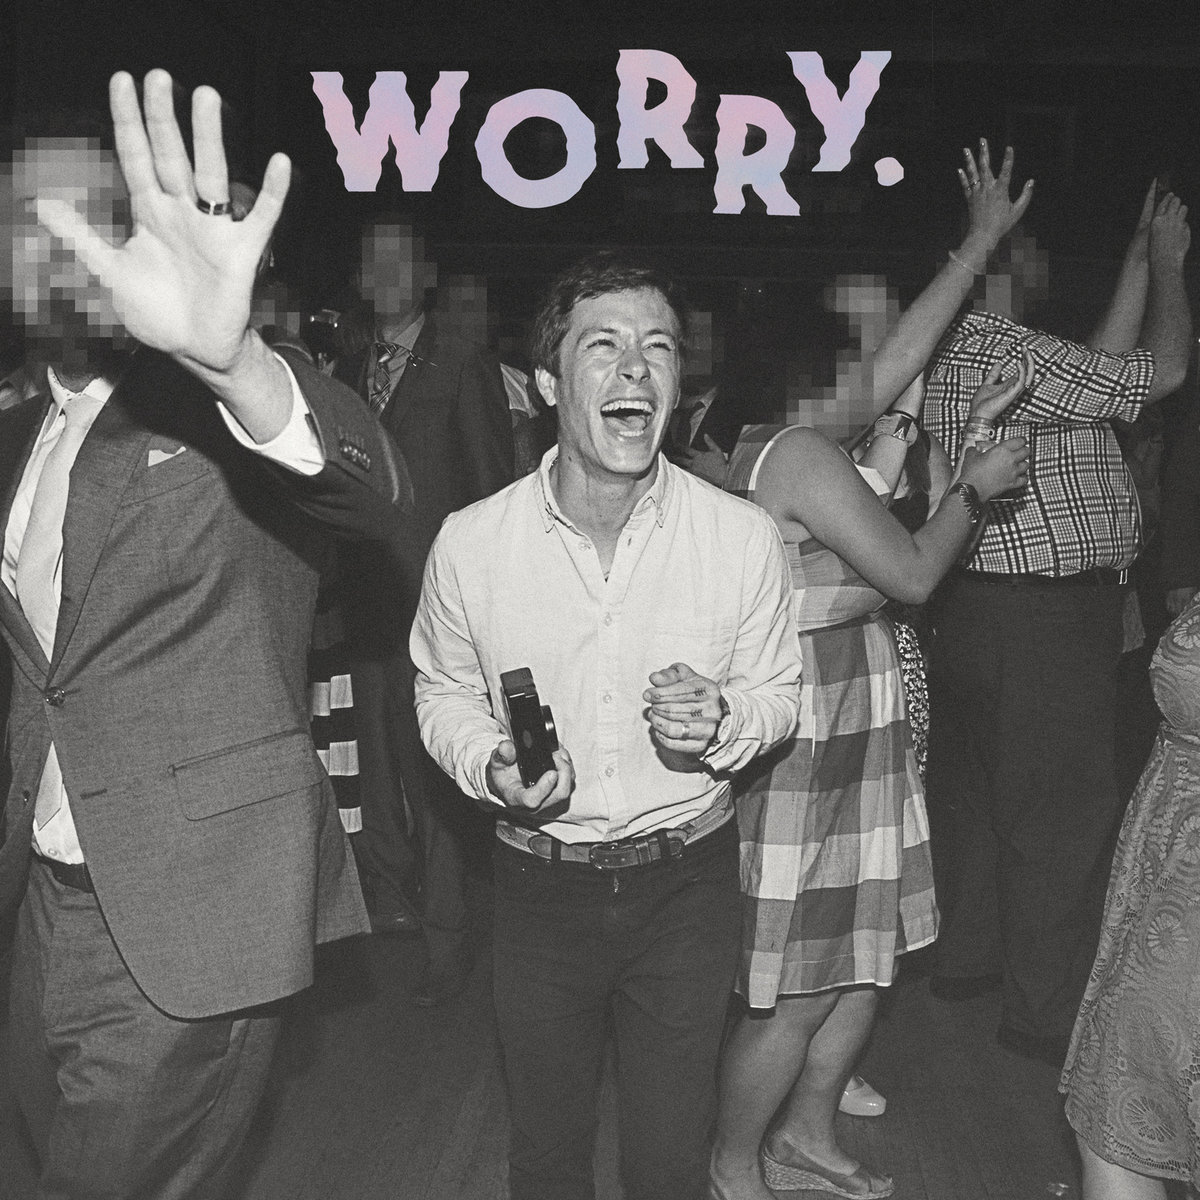 Jeff Rosenstock - Worry. LP / CD